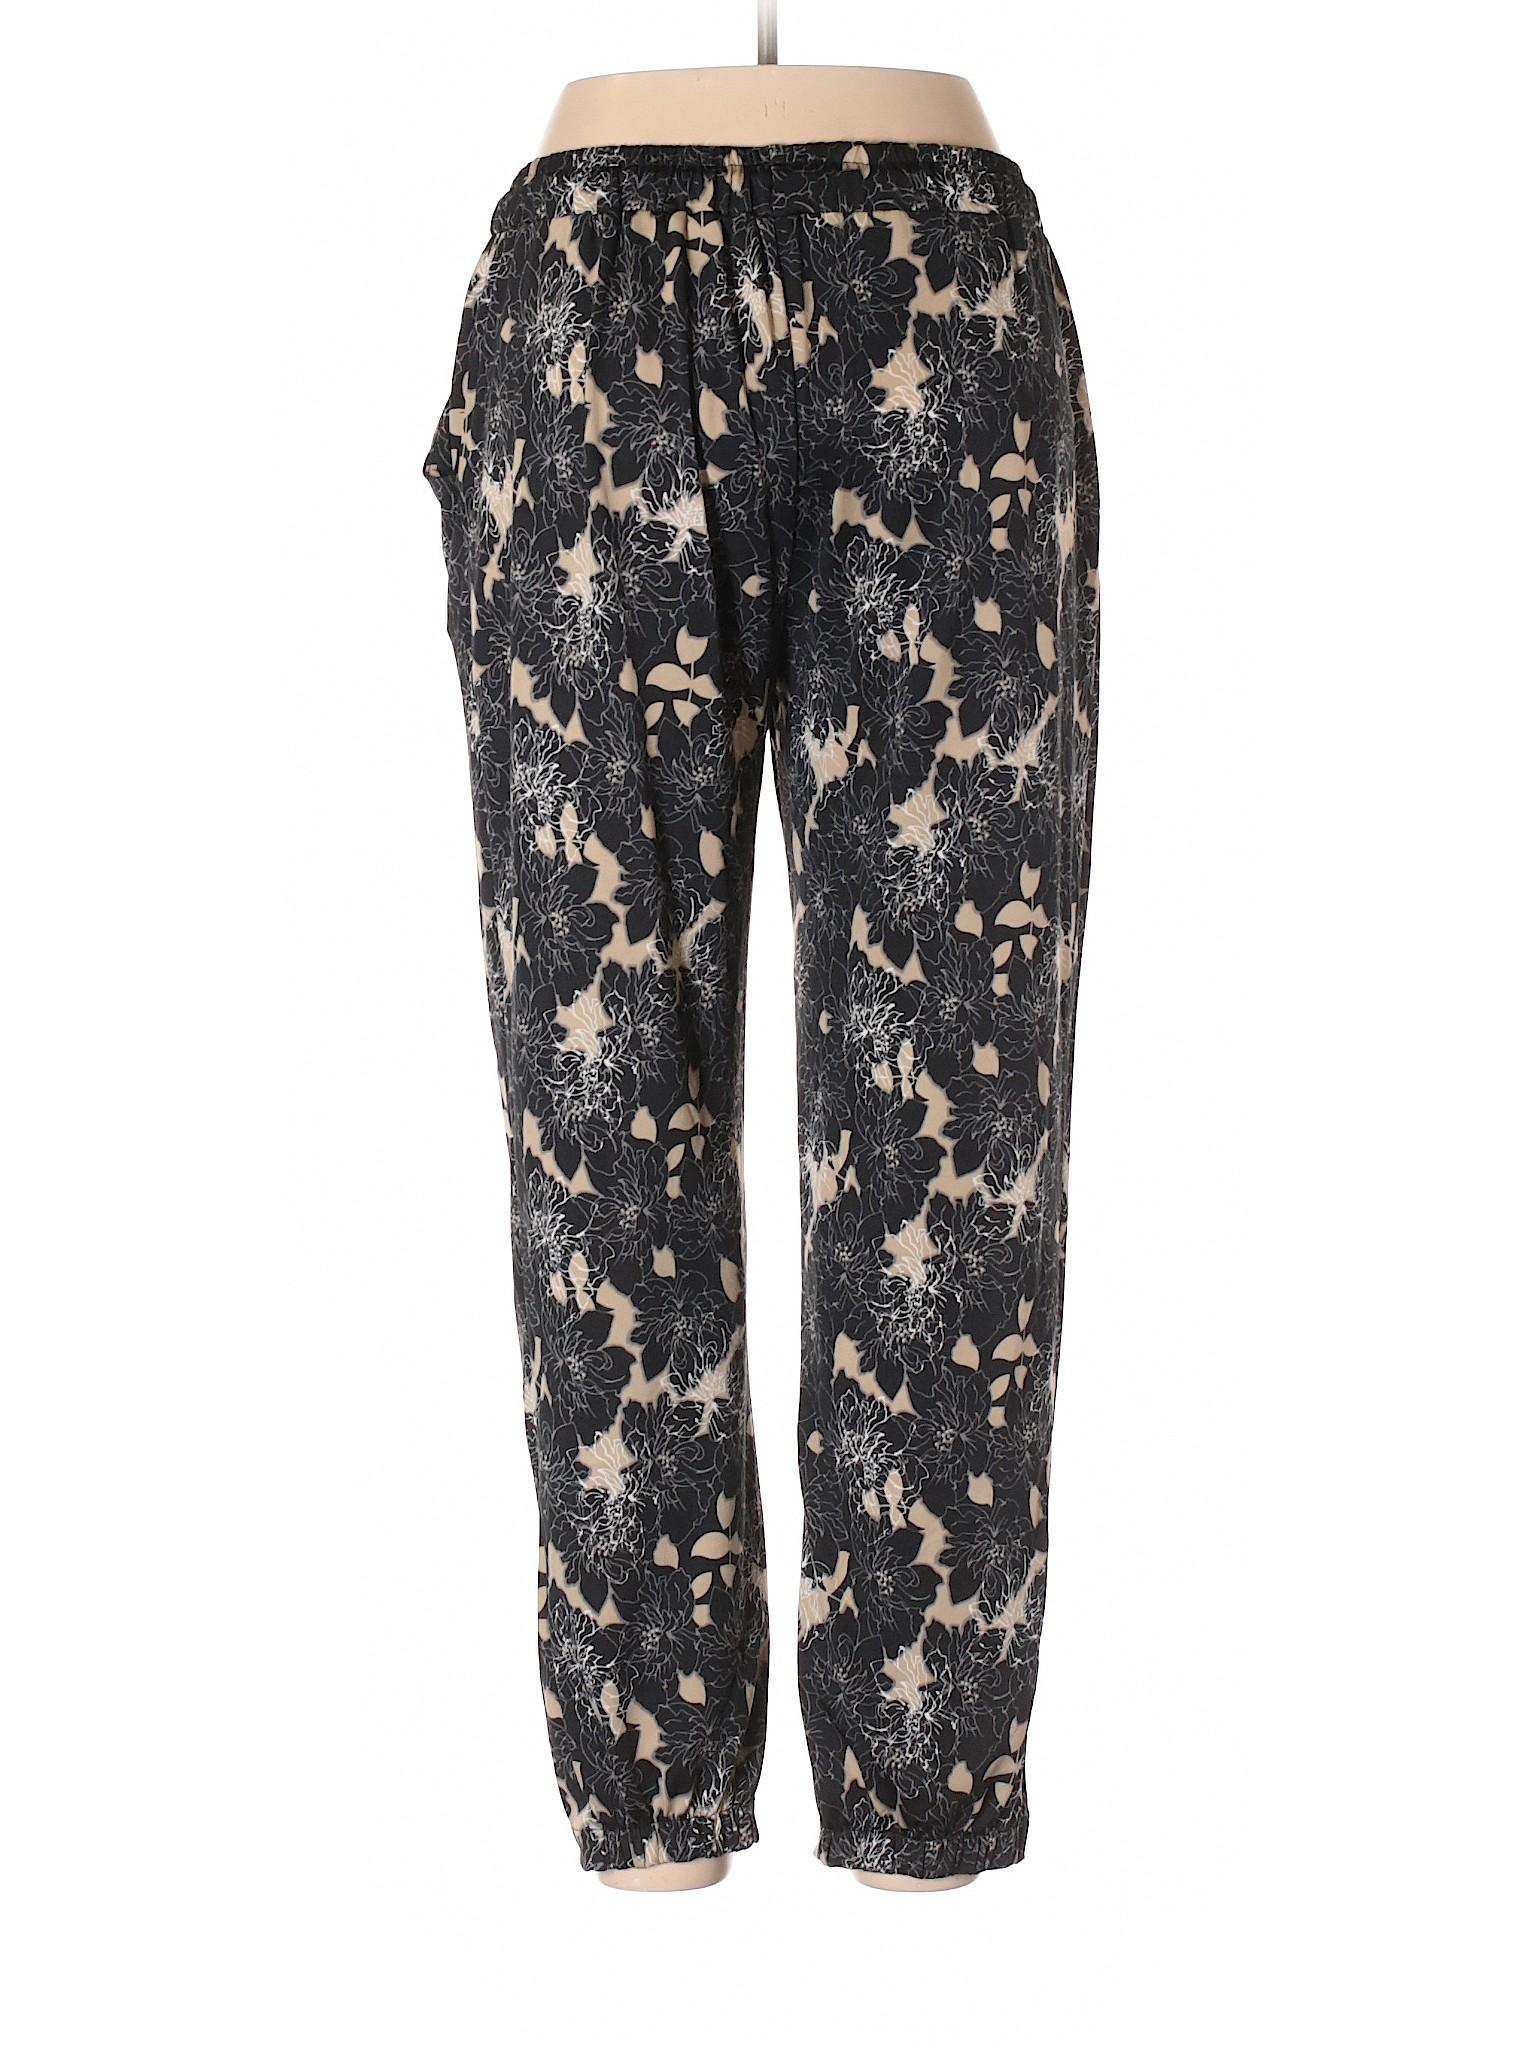 Honey Casual winter Lace amp; Pants Boutique xOnTqwF18a